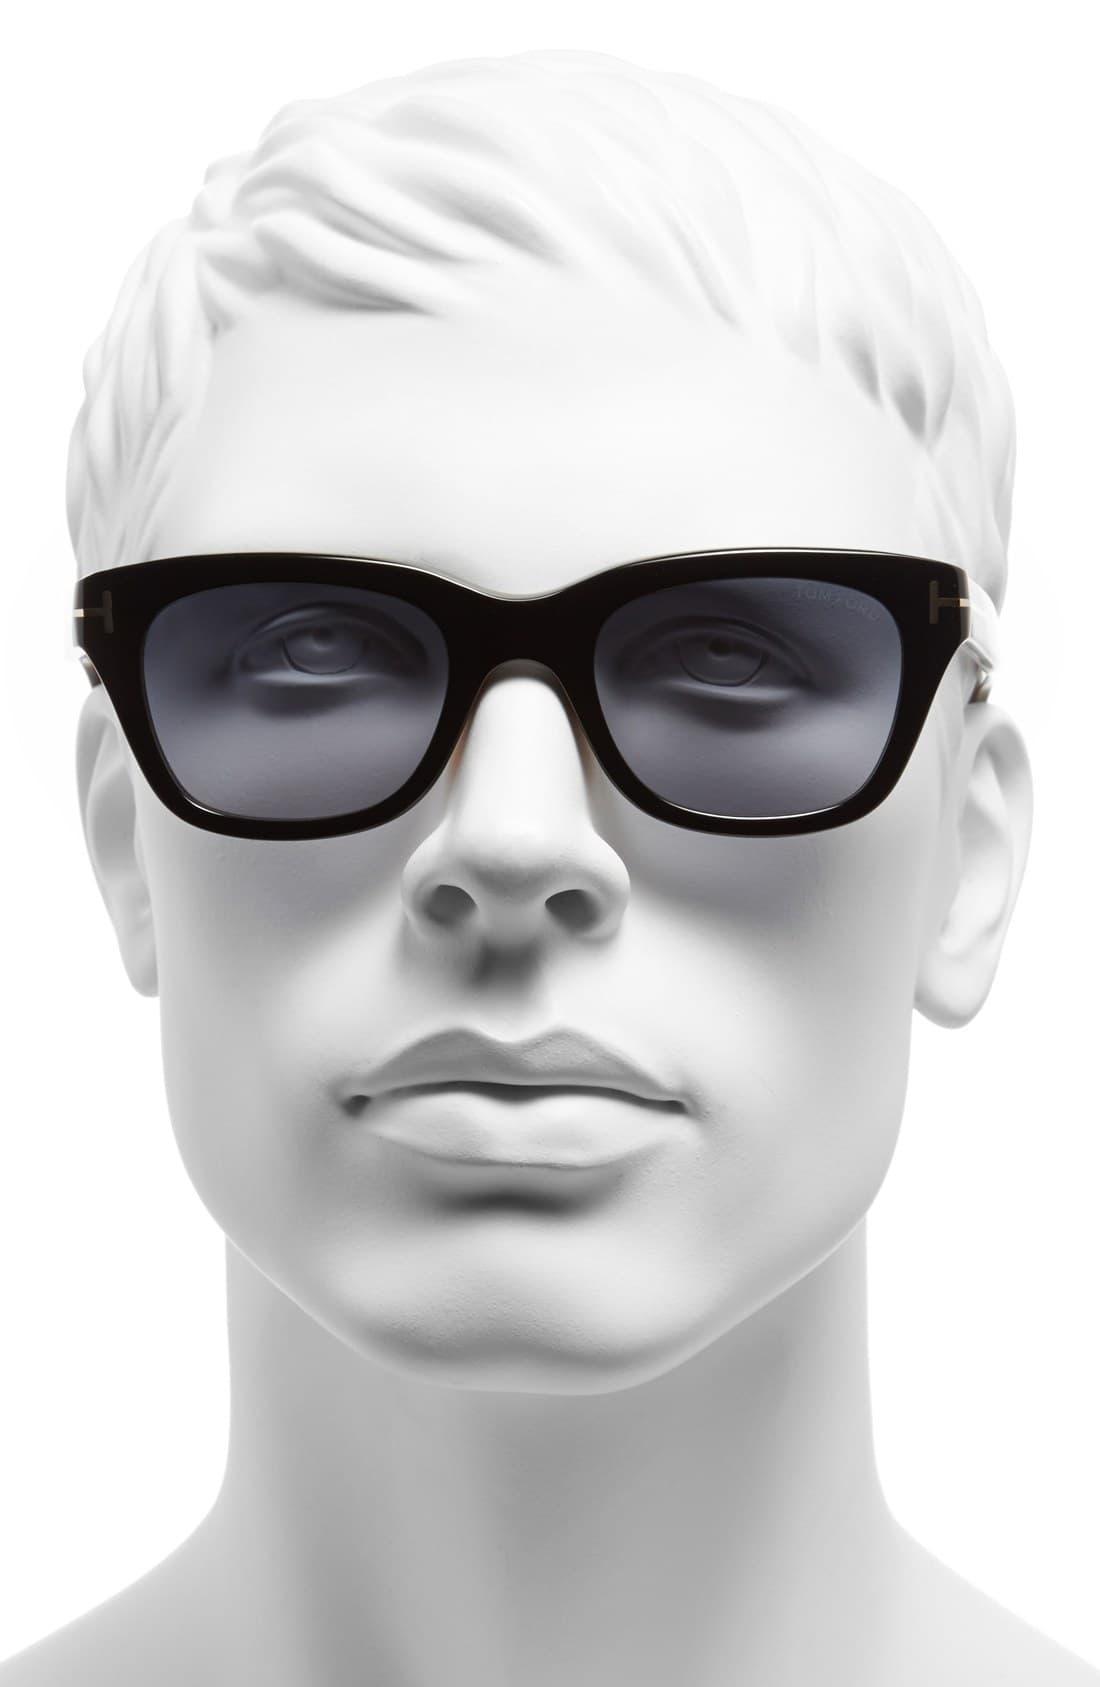 37e0479b81c1f Tom Ford -  snowdon  50mm Sunglasses - Shiny Black for Men - Lyst. View  fullscreen